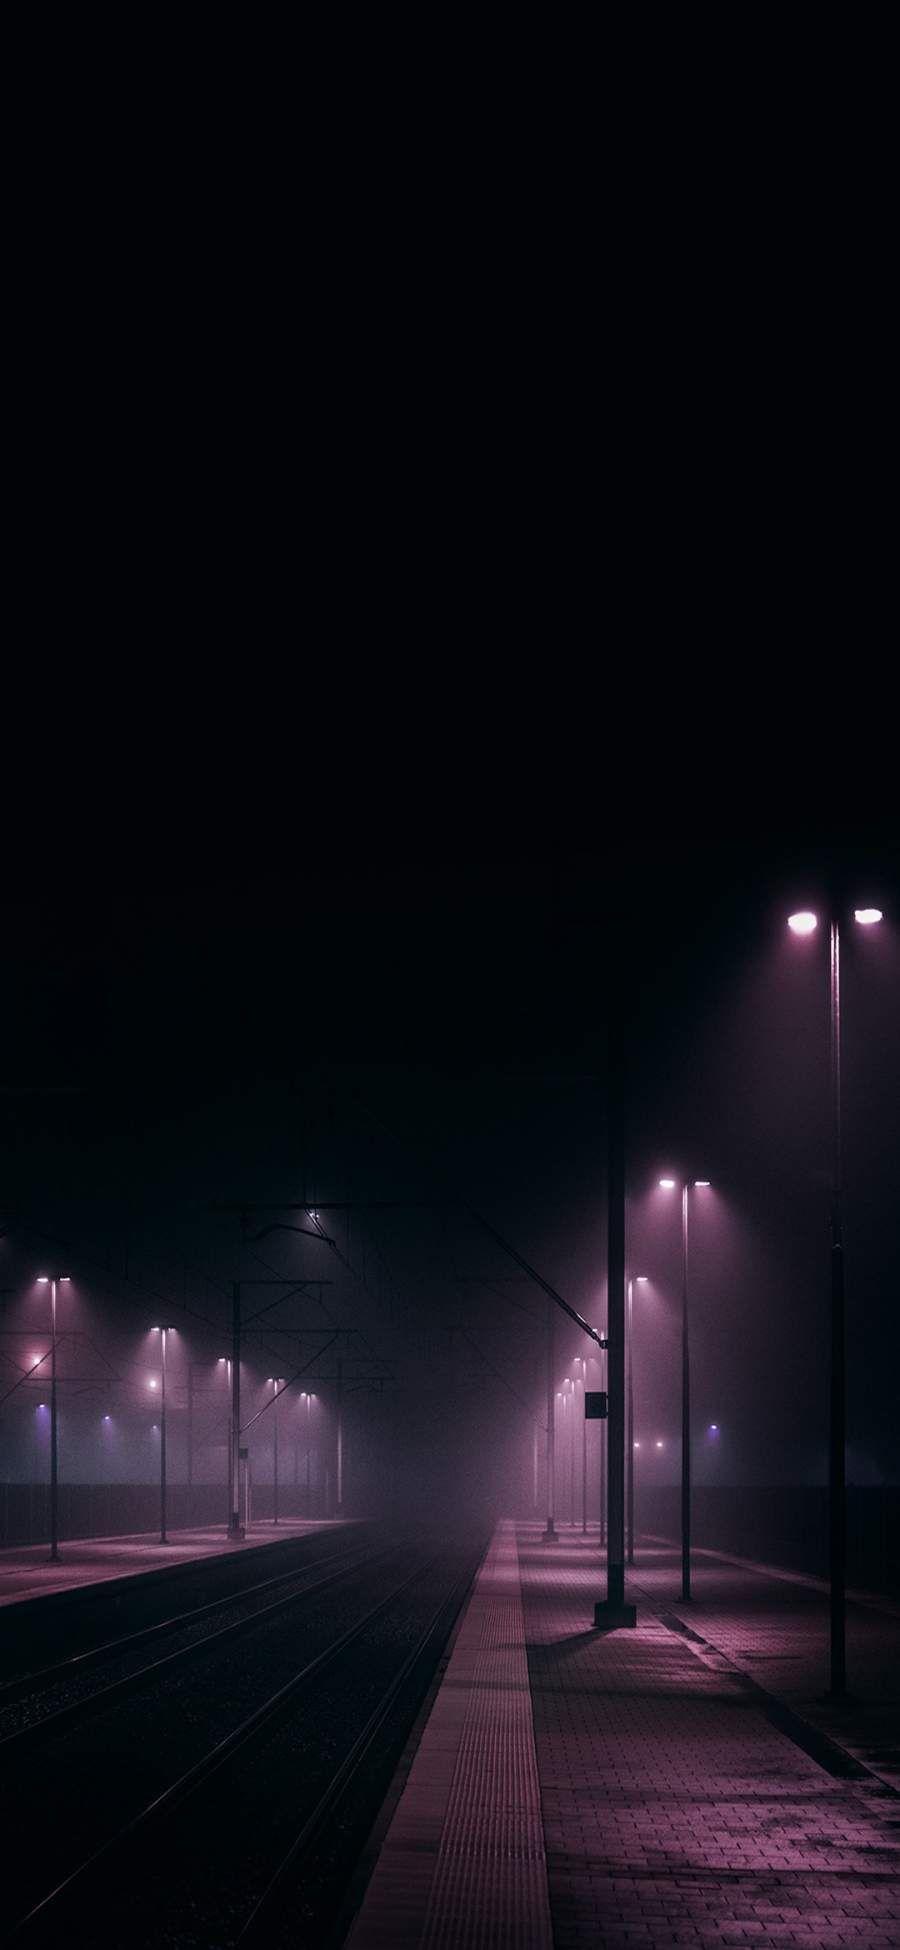 Night Light Wallpaper : night, light, wallpaper, Night, Lights, IPhone, Wallpaper, Minimalist, Phone,, Abstract, Iphone, Wallpaper,, Samsung